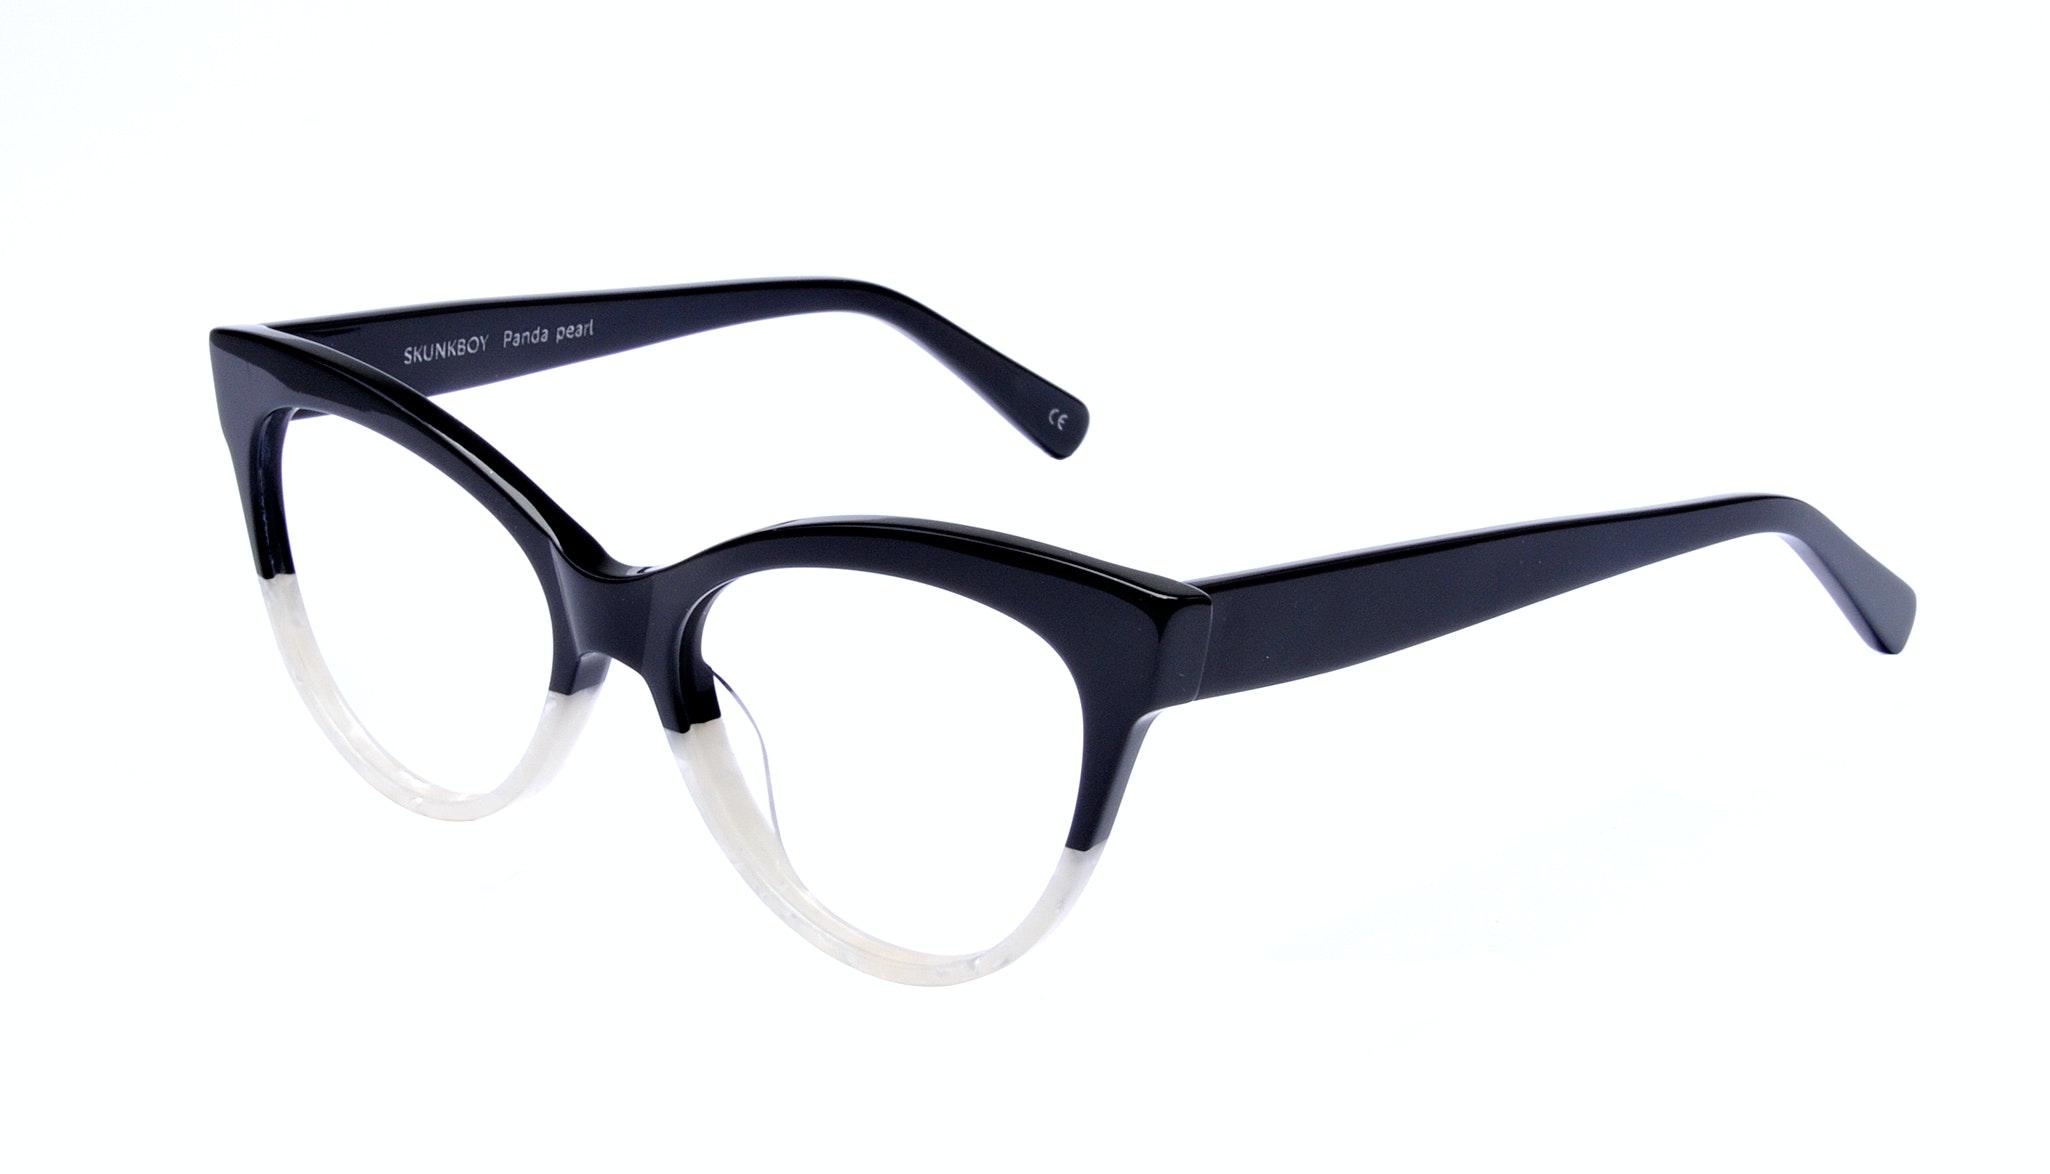 Affordable Fashion Glasses Cat Eye Eyeglasses Women SkunkBoy Panda Pearl Tilt